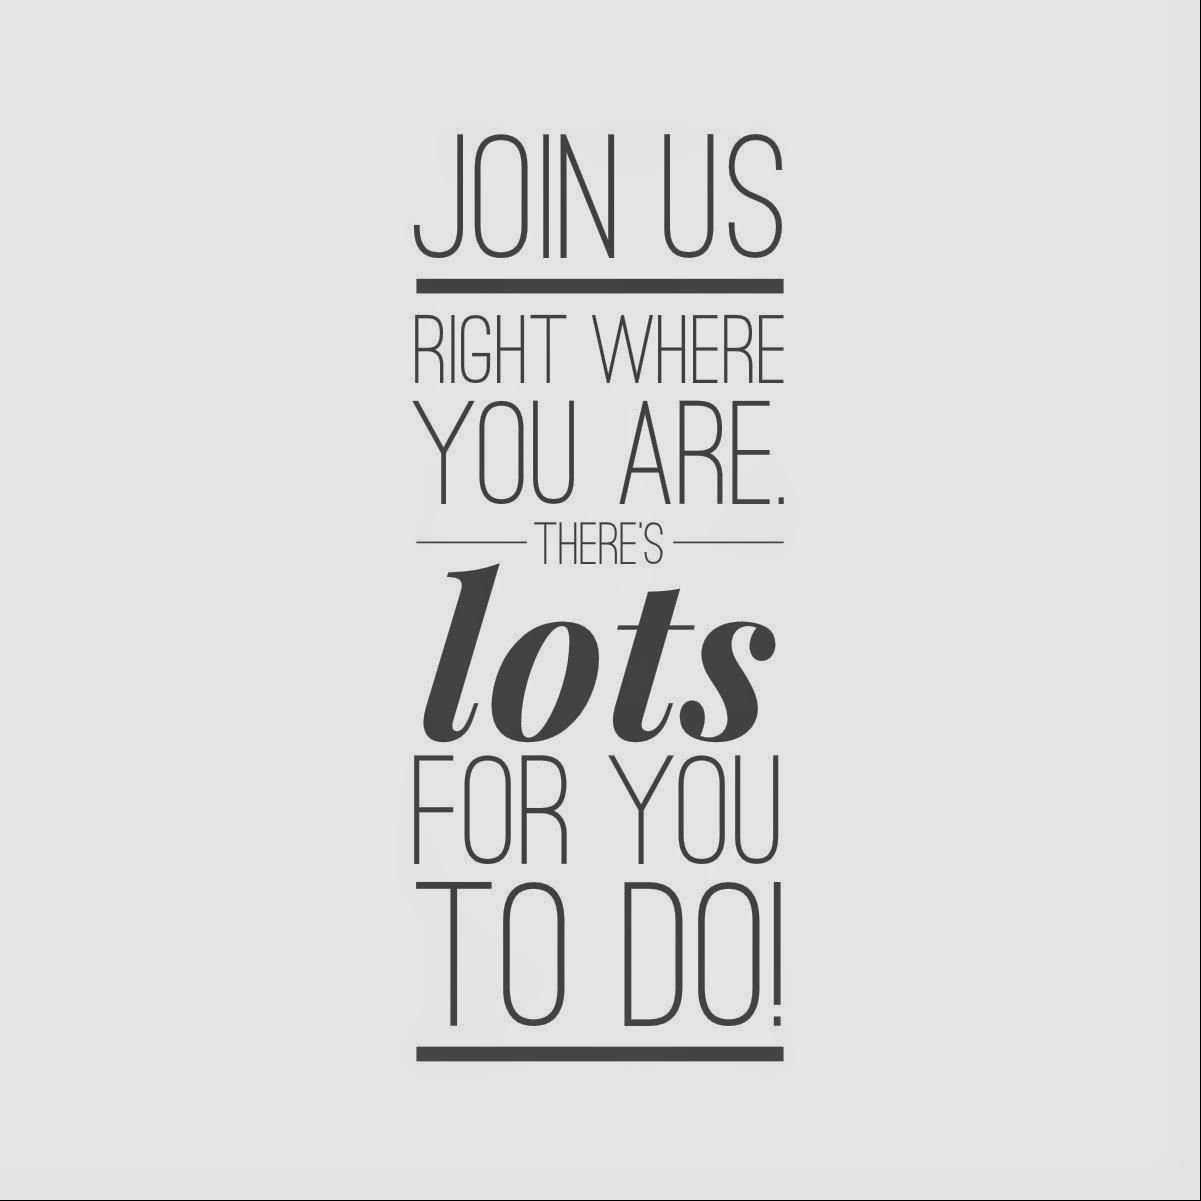 We need your involvement!